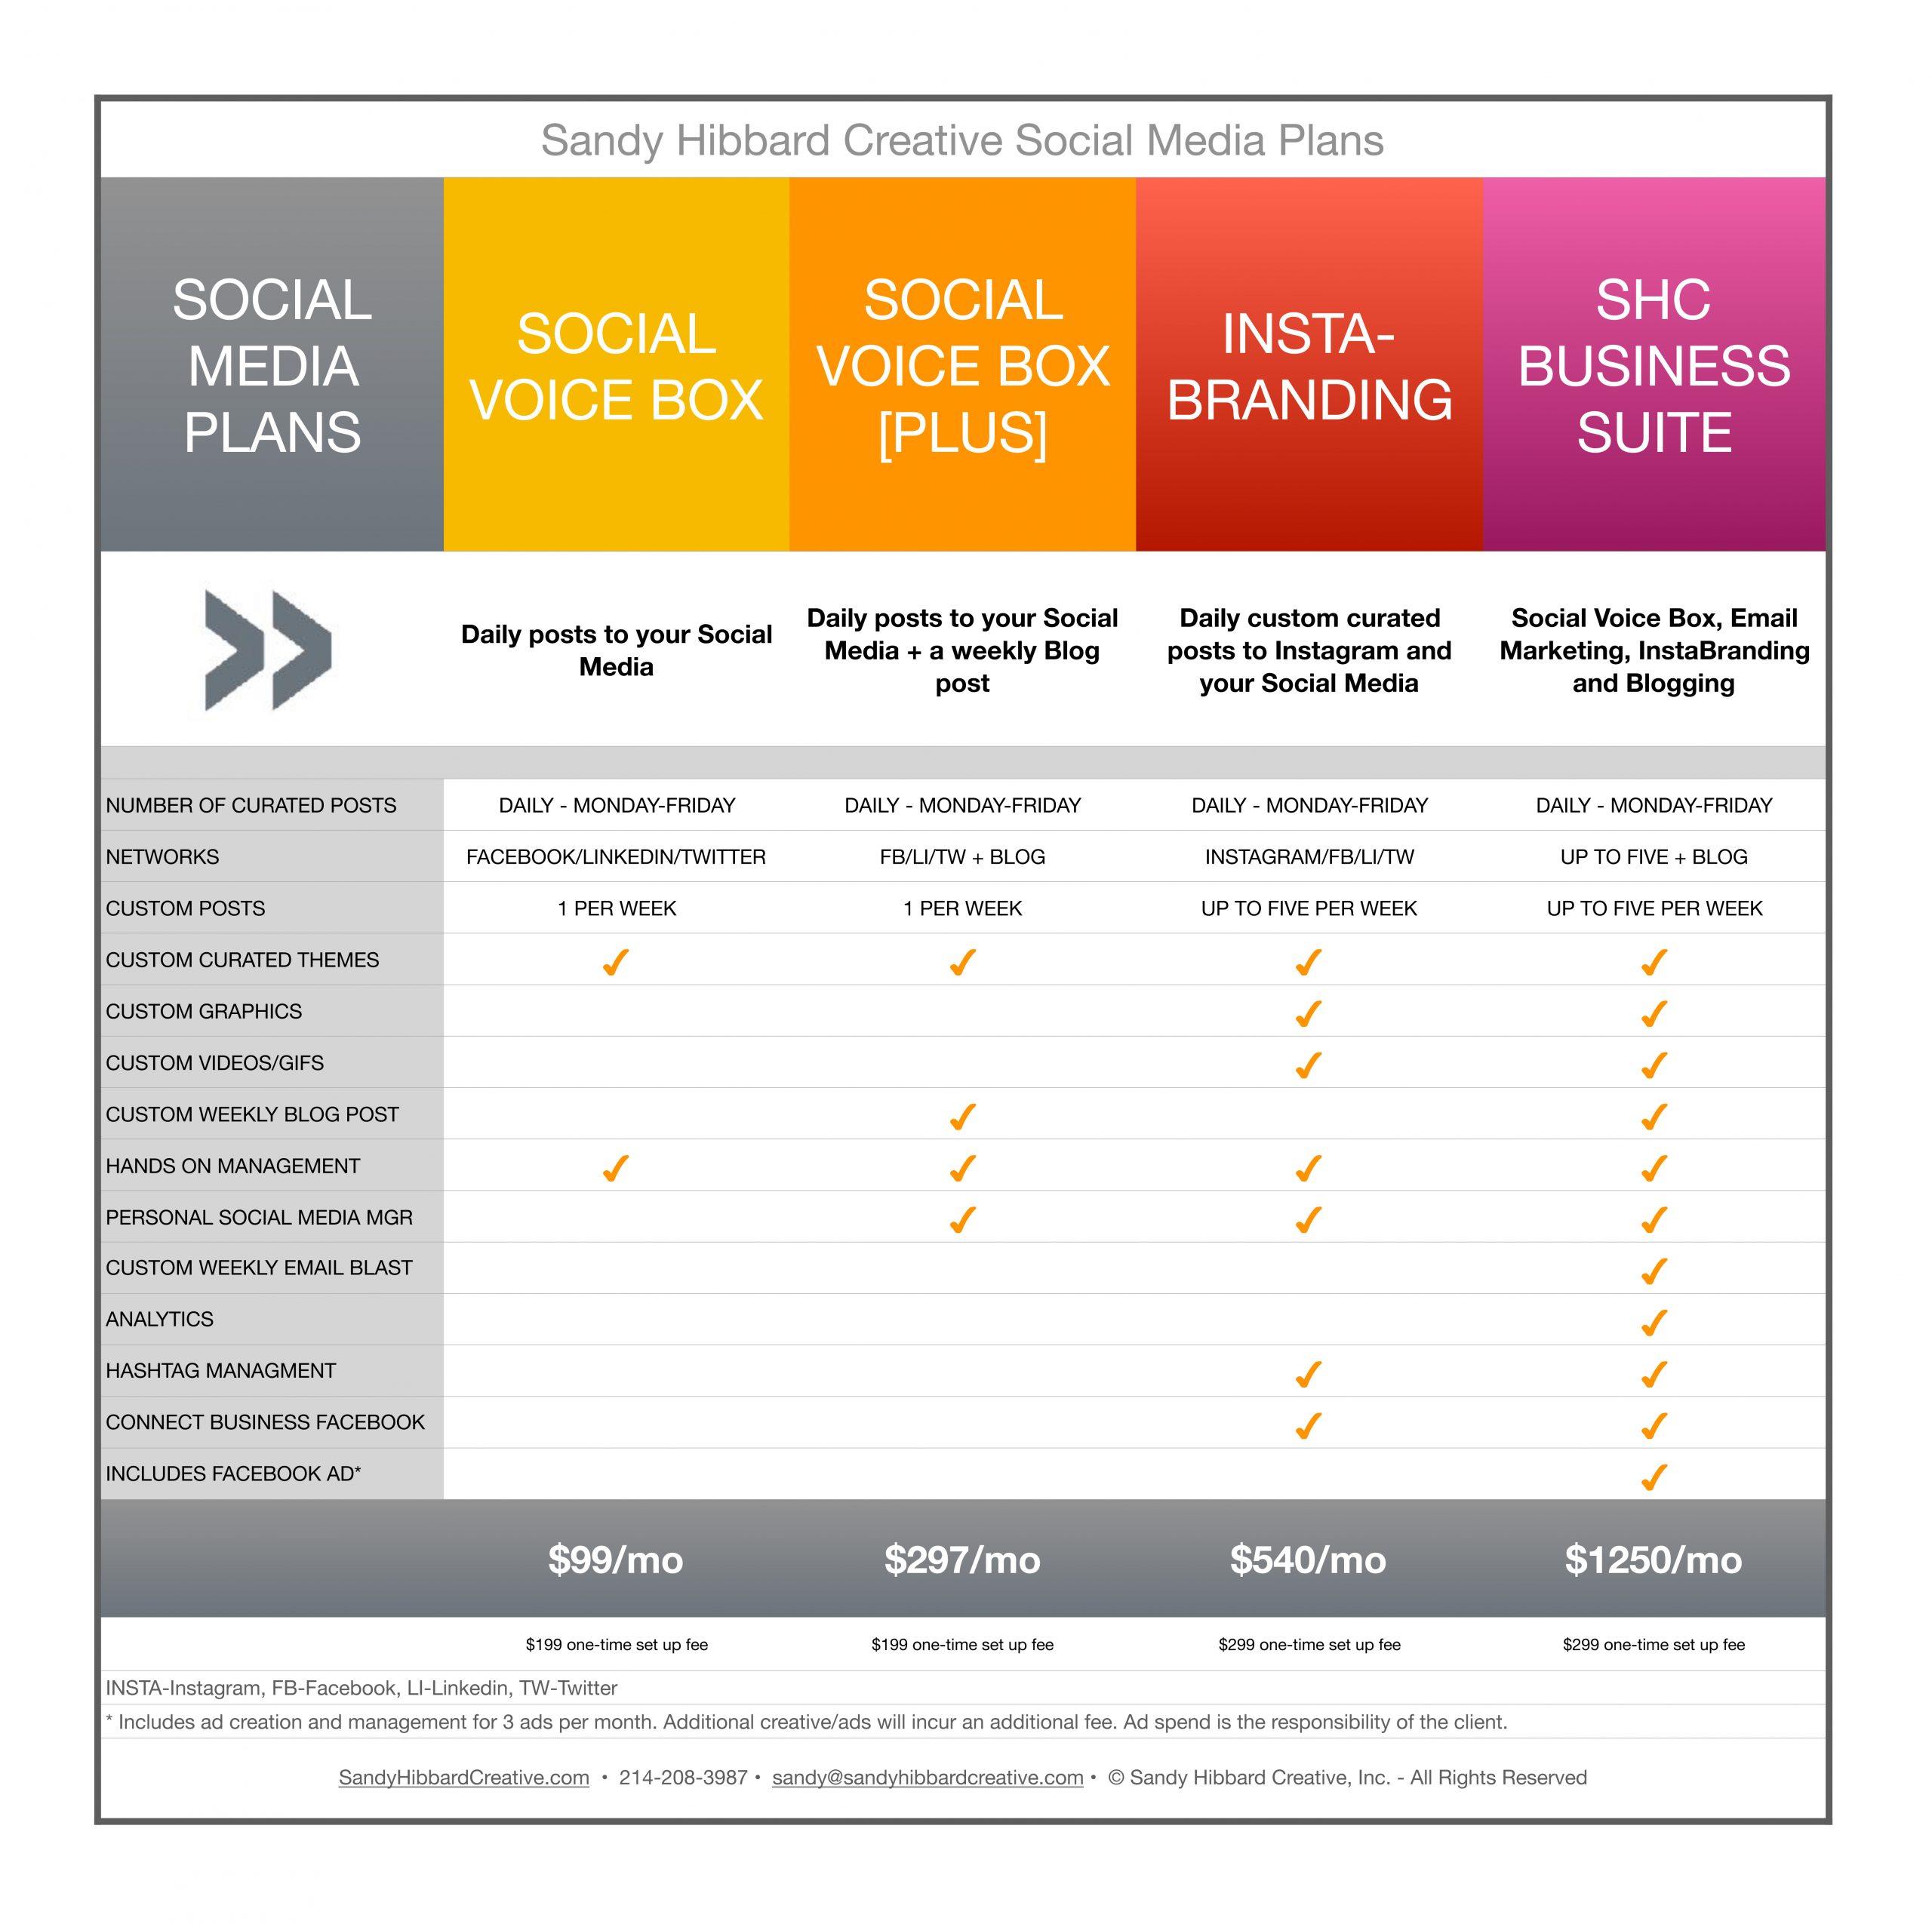 sandy hibbard creative pricing list for social media services